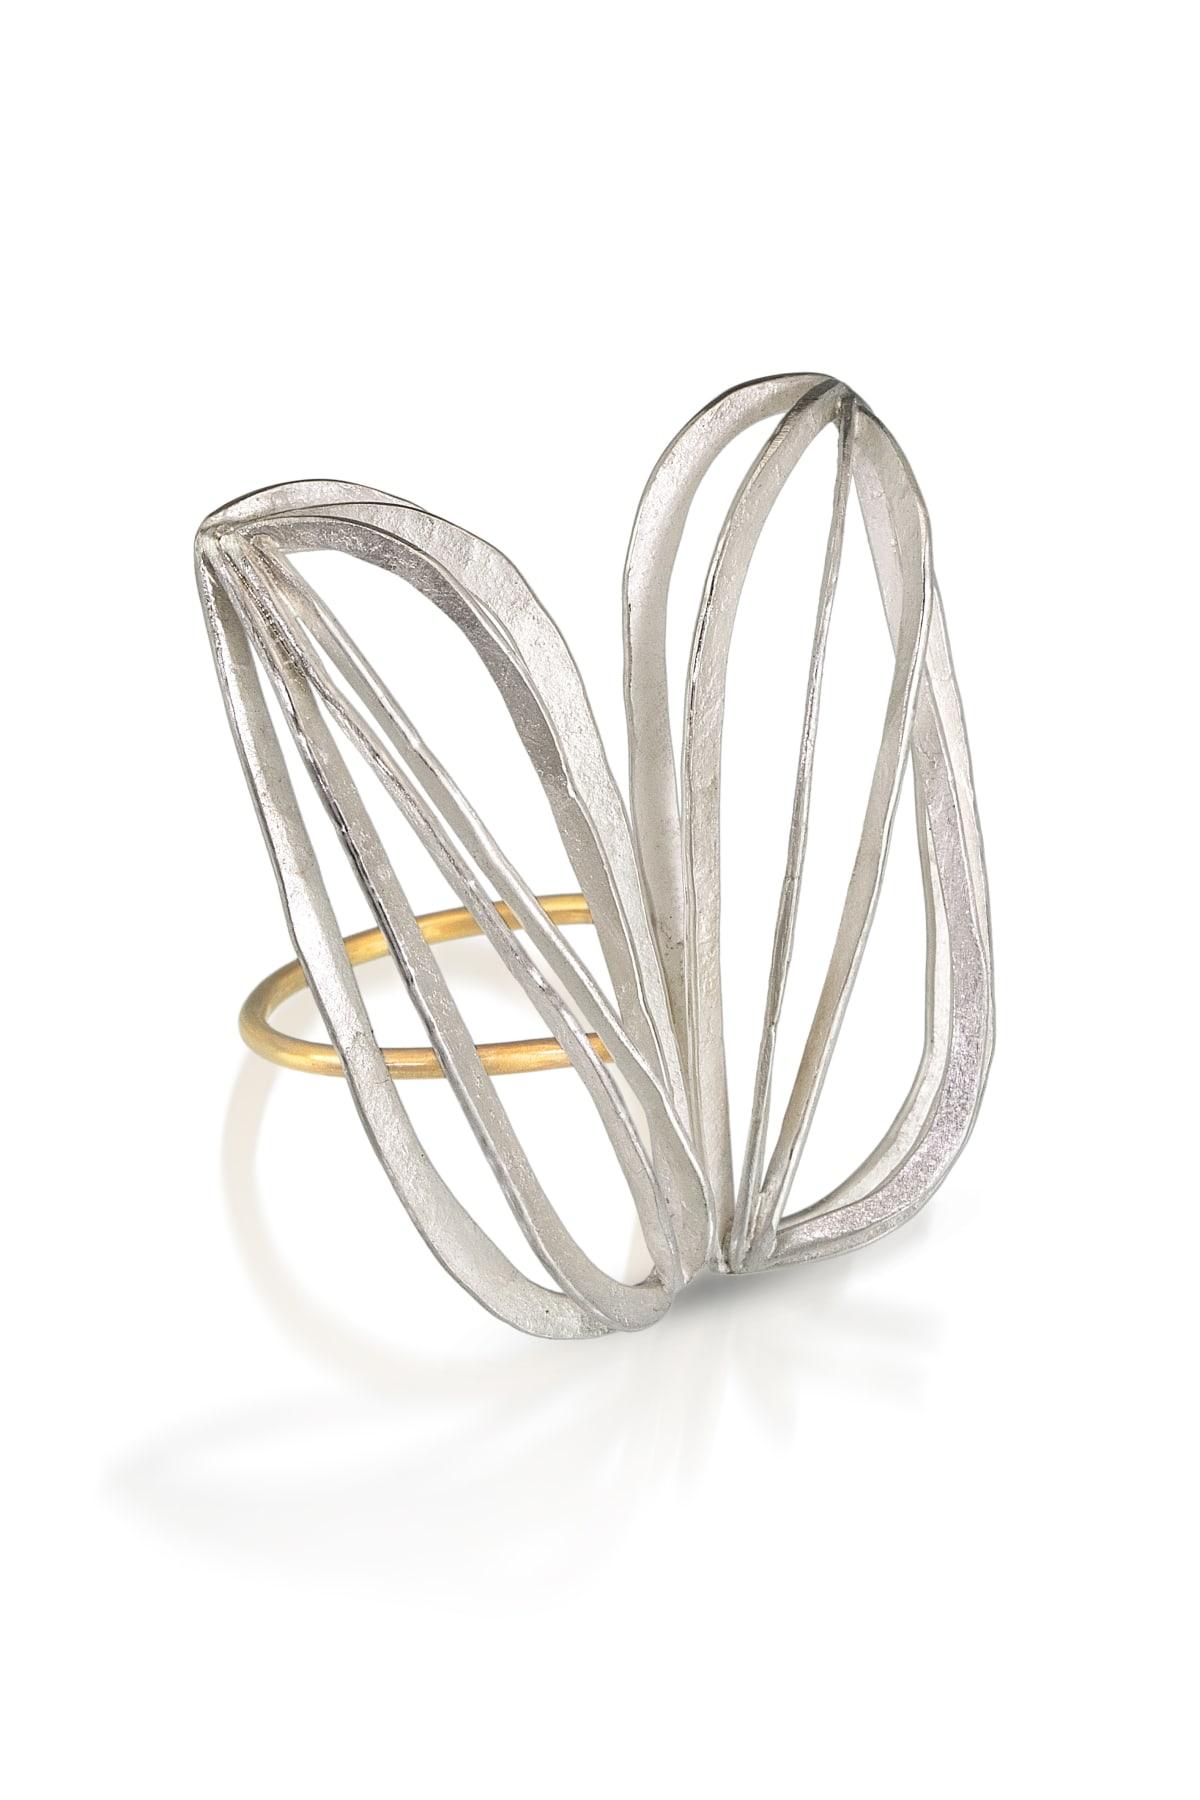 Leia Zumbro, Reflections Ring, 2018